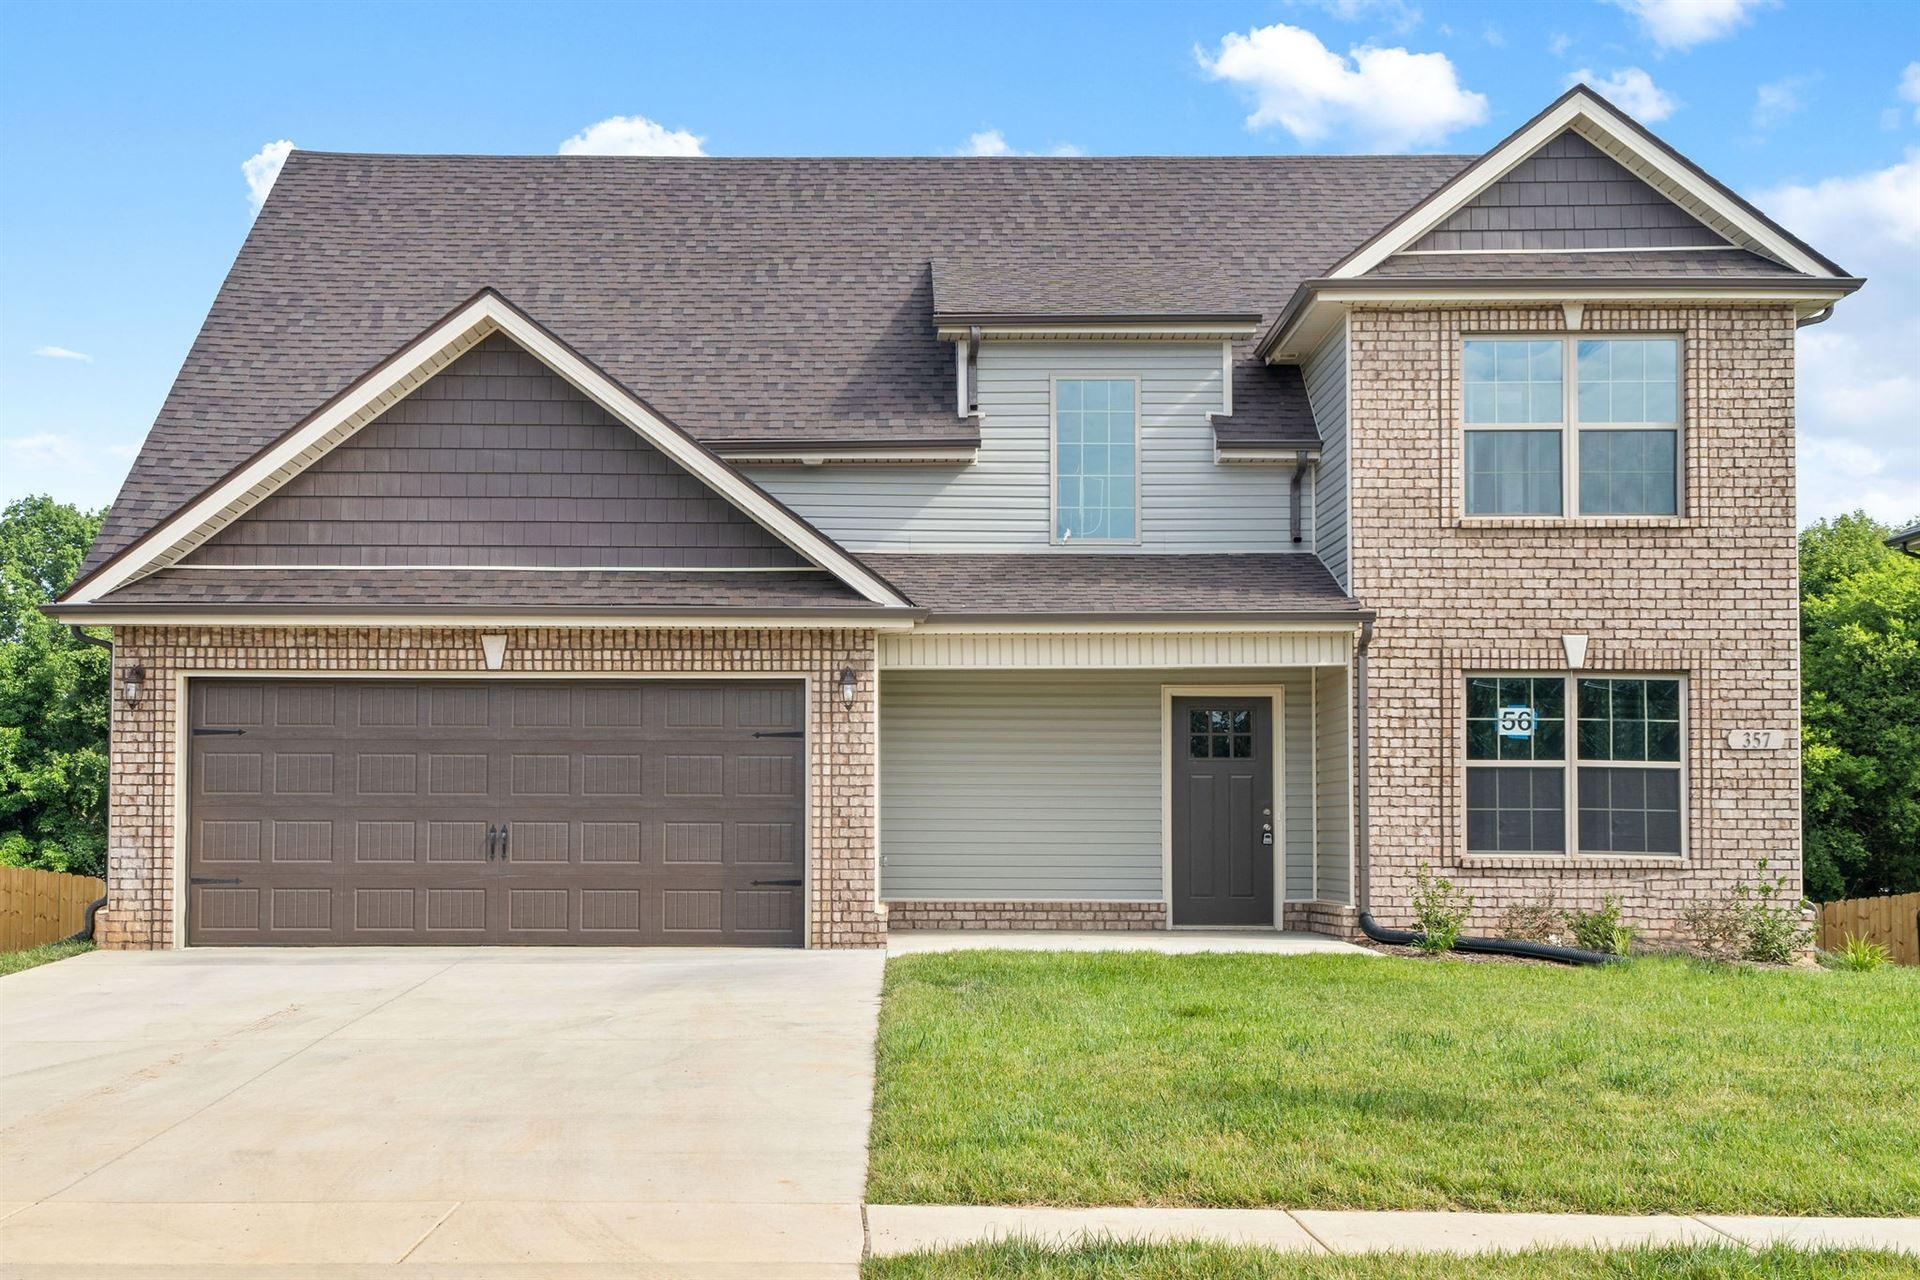 94 Dunbar, Clarksville, TN 37043 - MLS#: 2220491